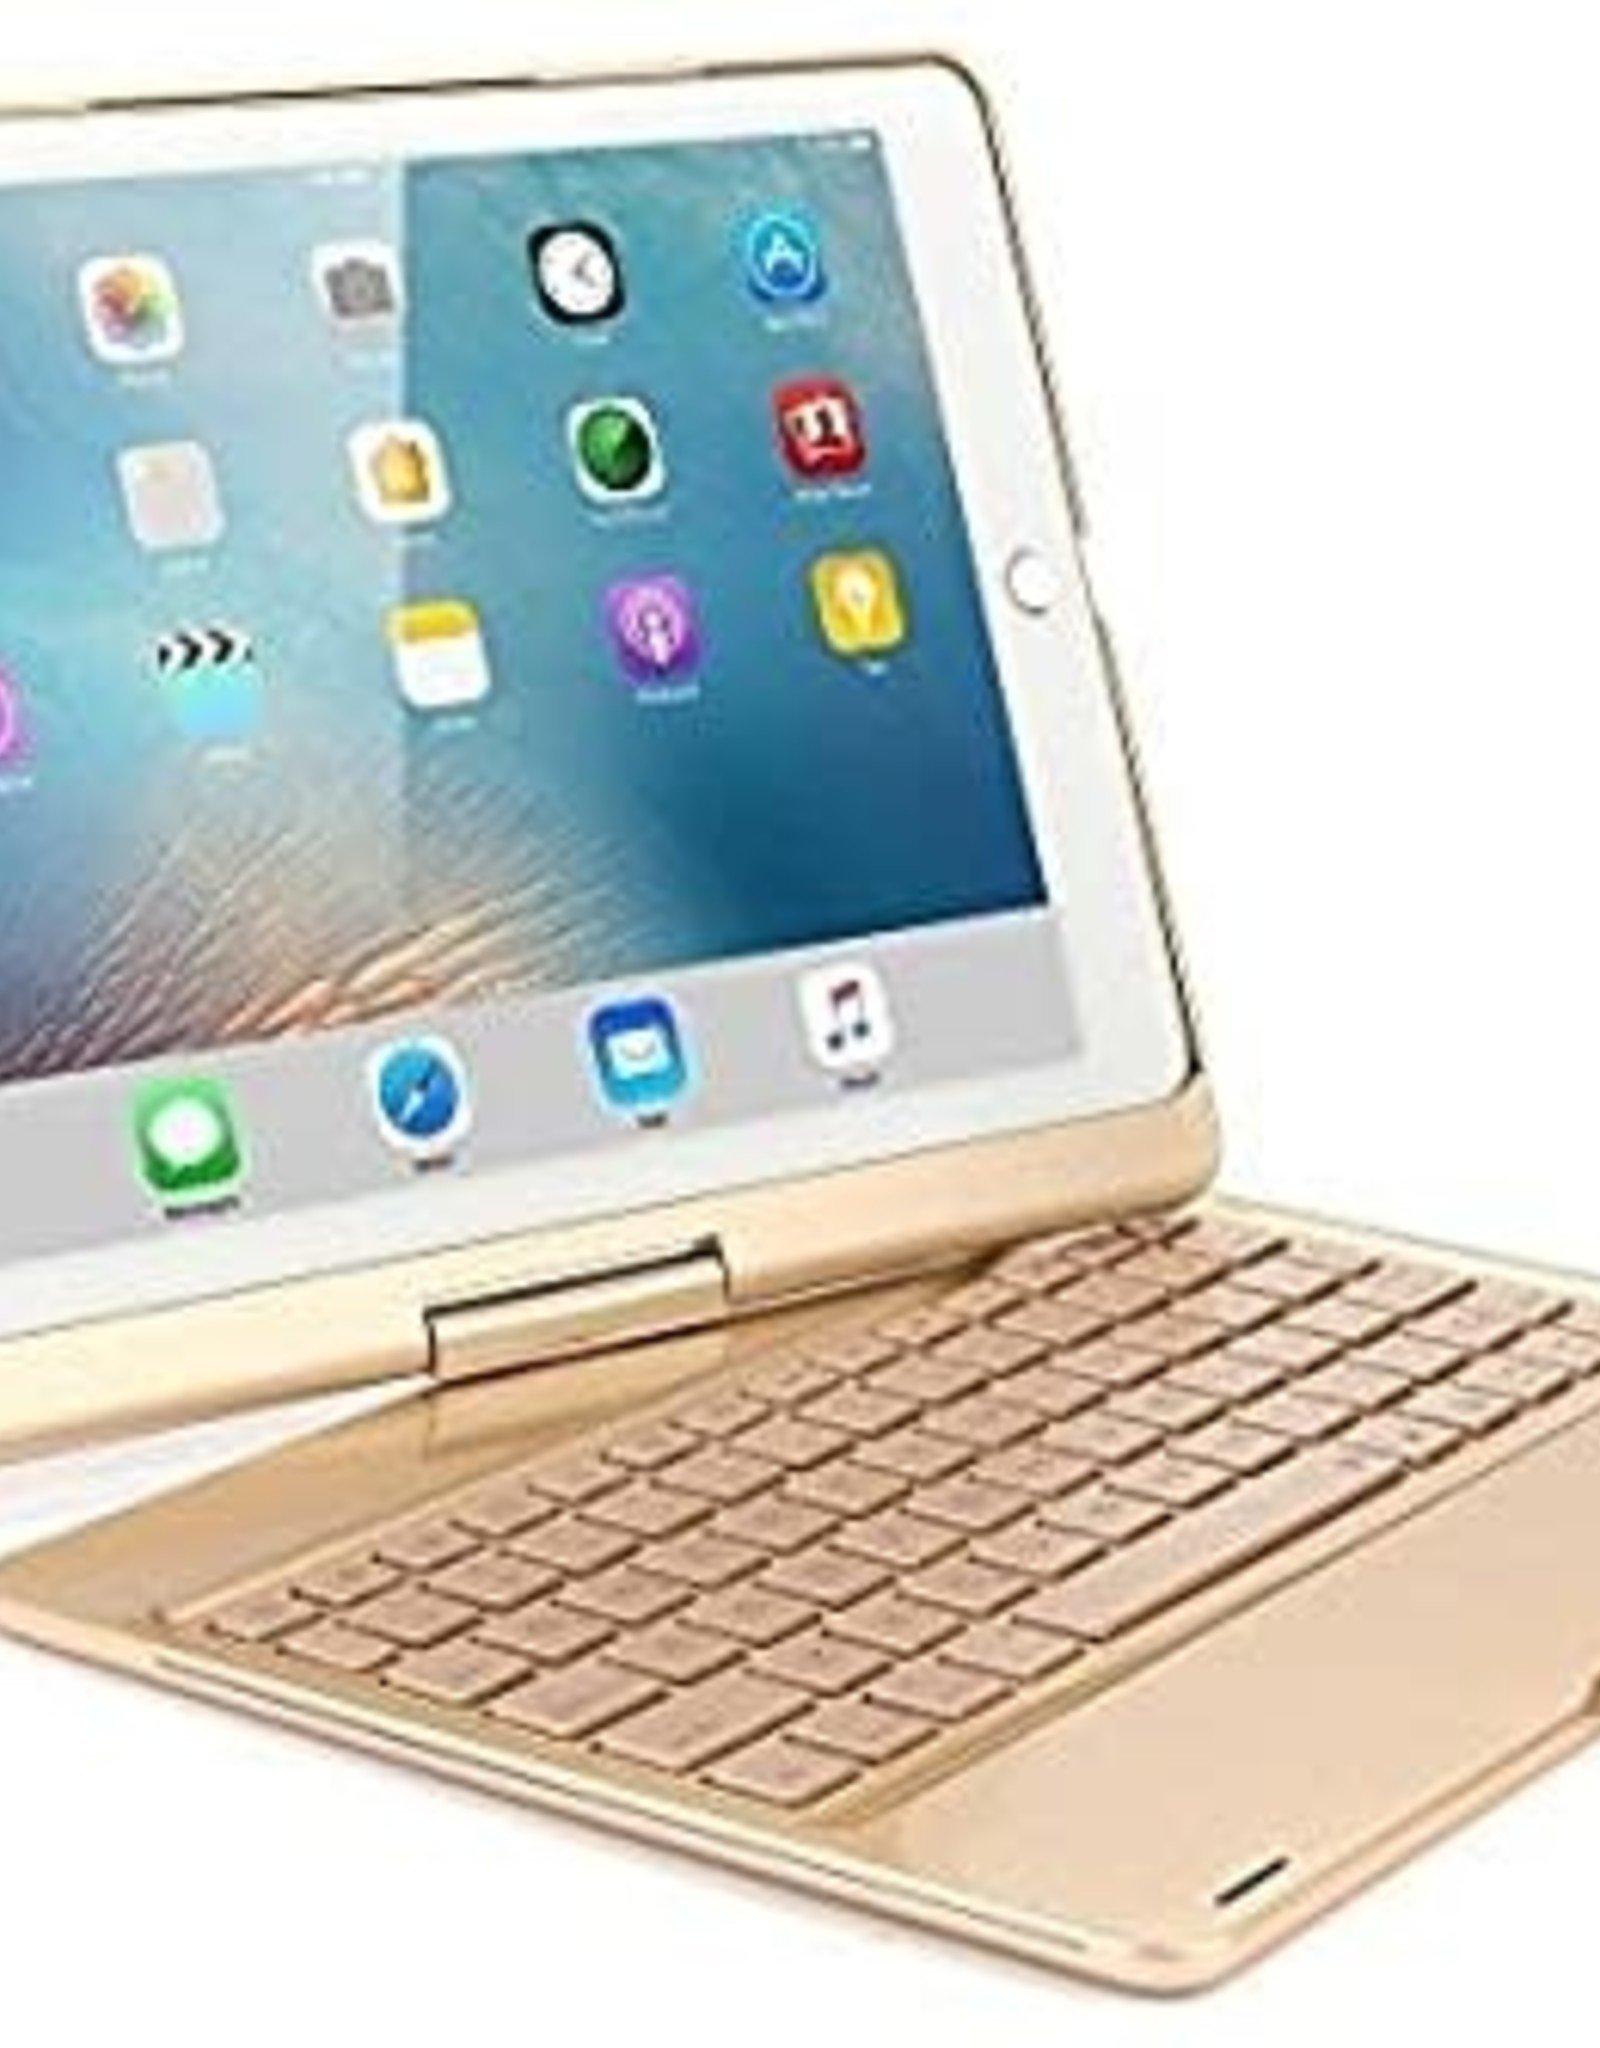 Backlight 360 degree rotary bluetooth wireless keyboard case, detechable iPad 12.9 2020 Gold